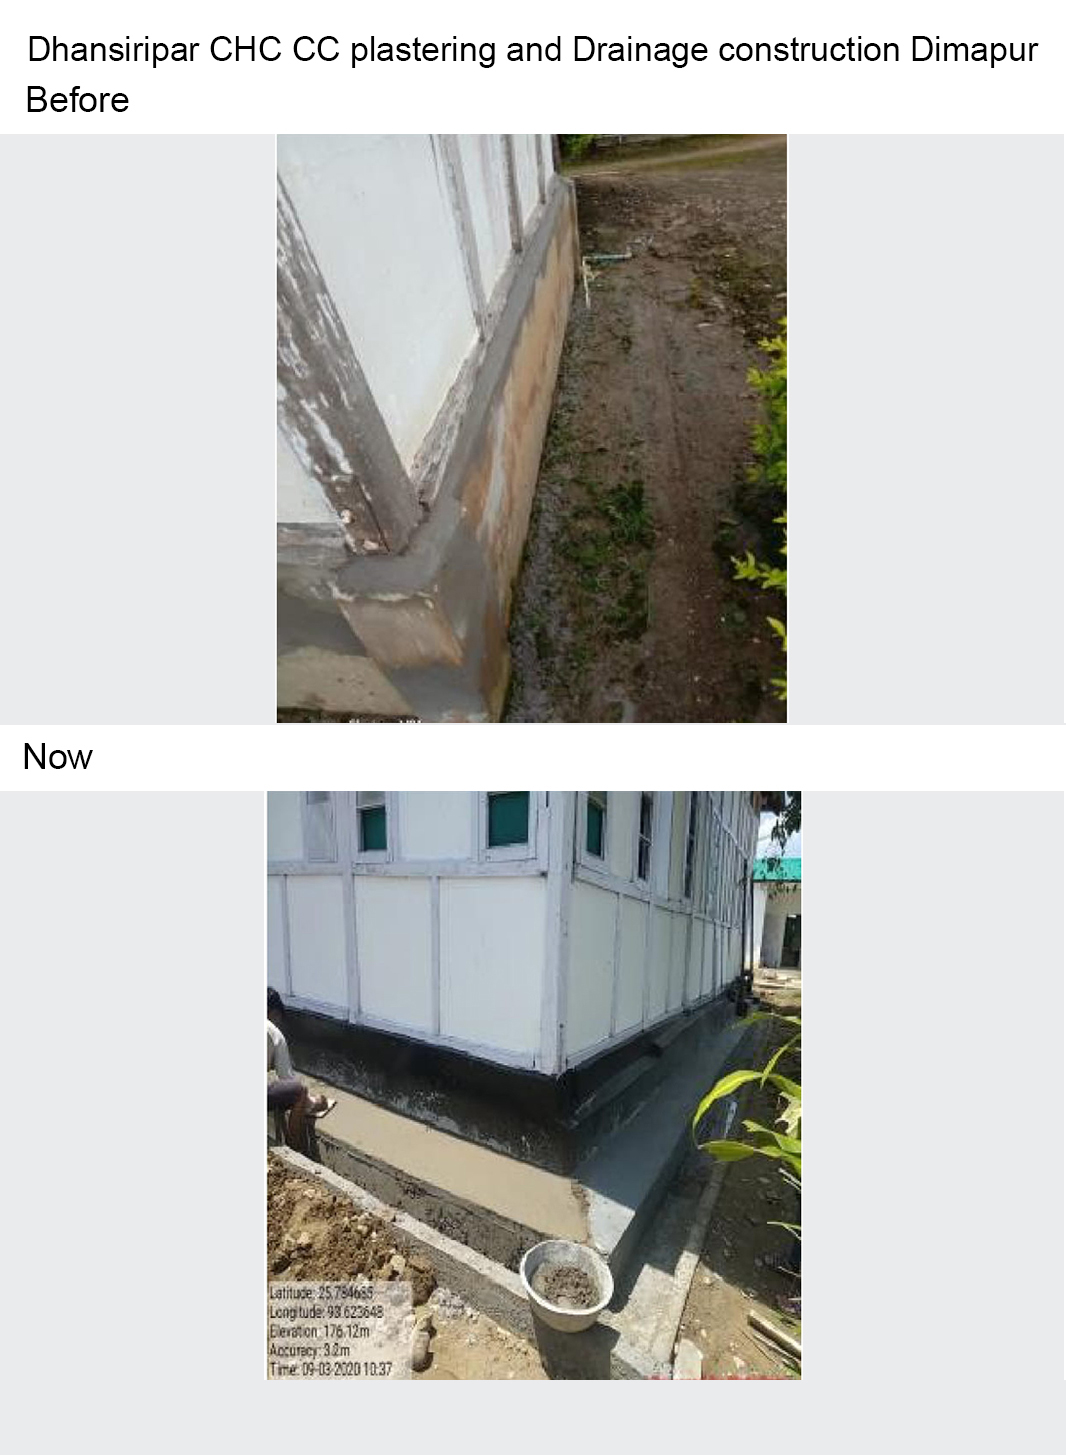 Dhansiripar-CHC-CC-plastering-and-Drainage-construction-Dimapur